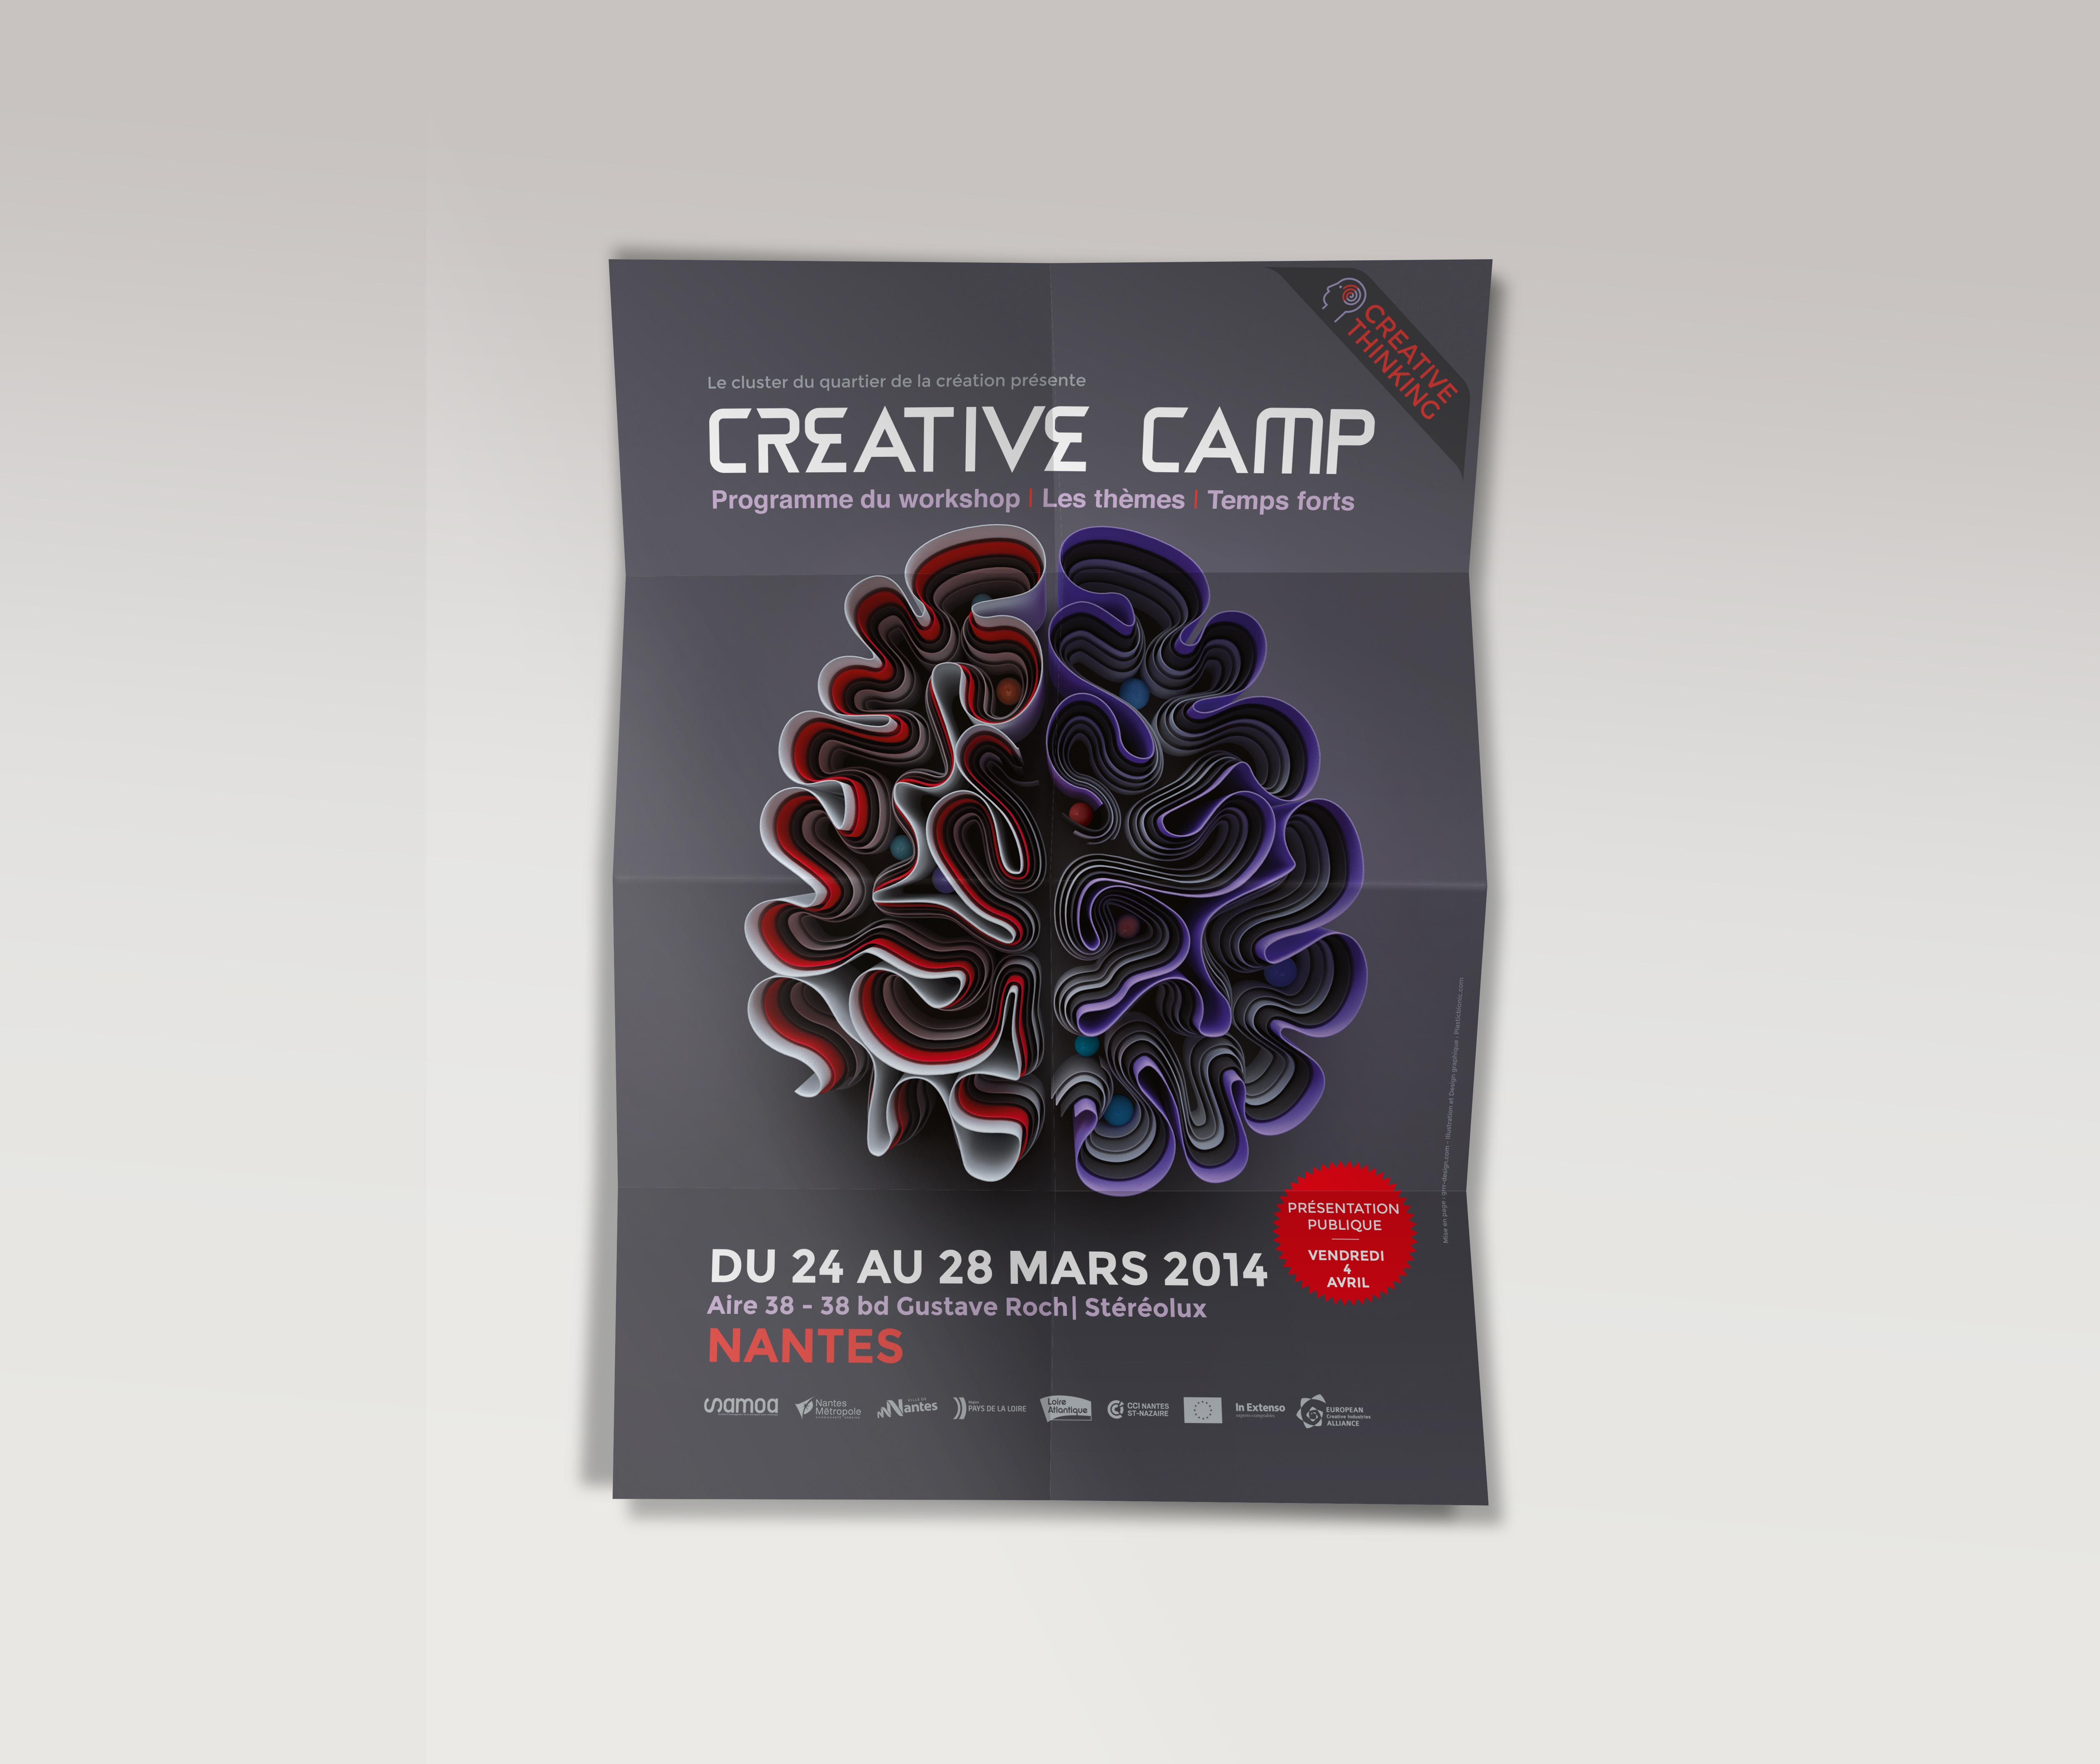 Affiche A3 creative camp samoa nantes